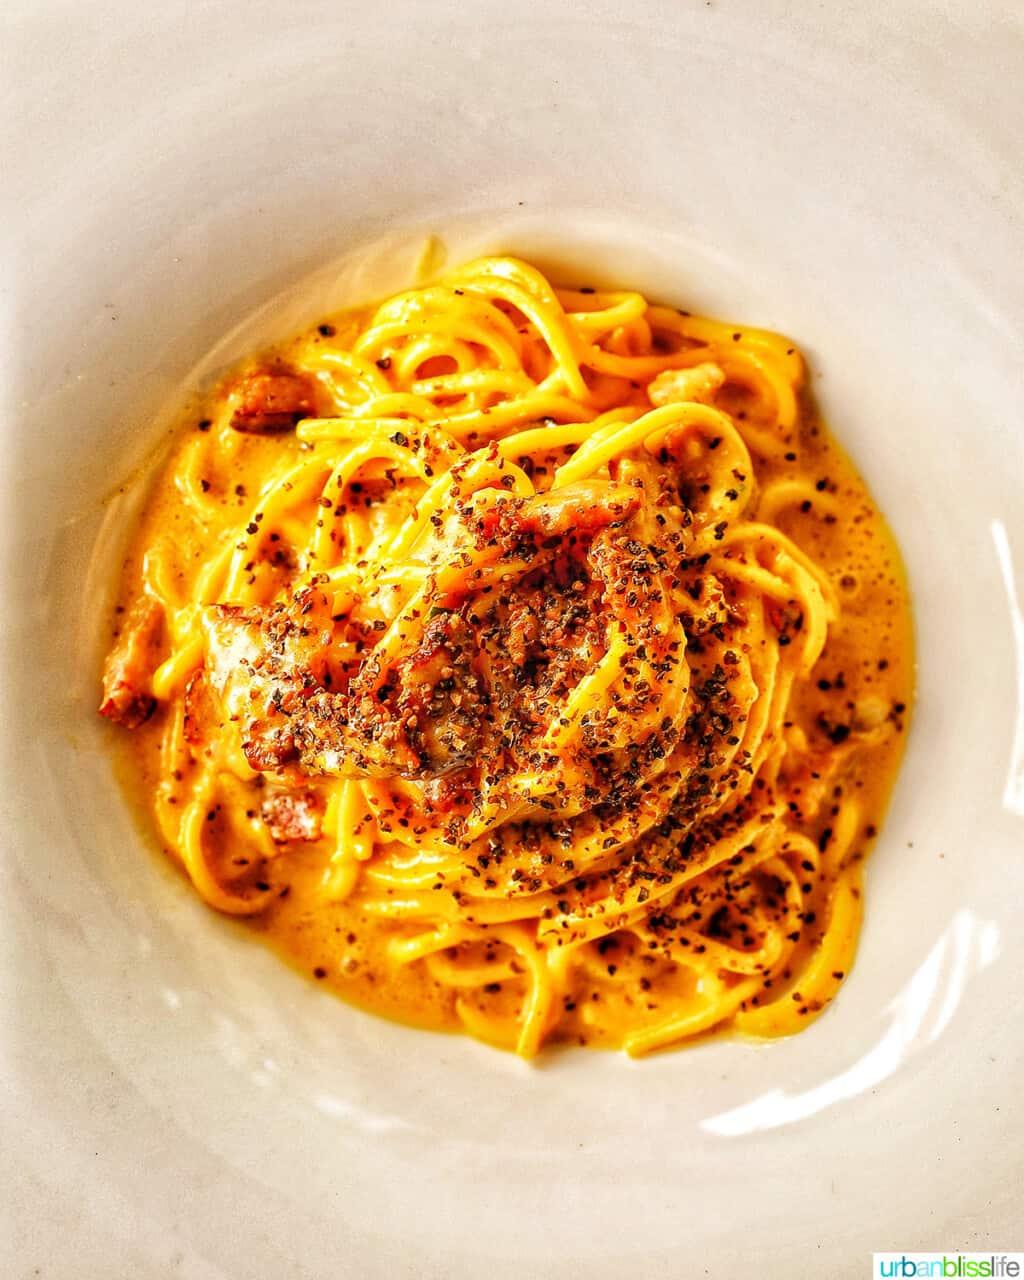 bowl of spaghetti carbonara